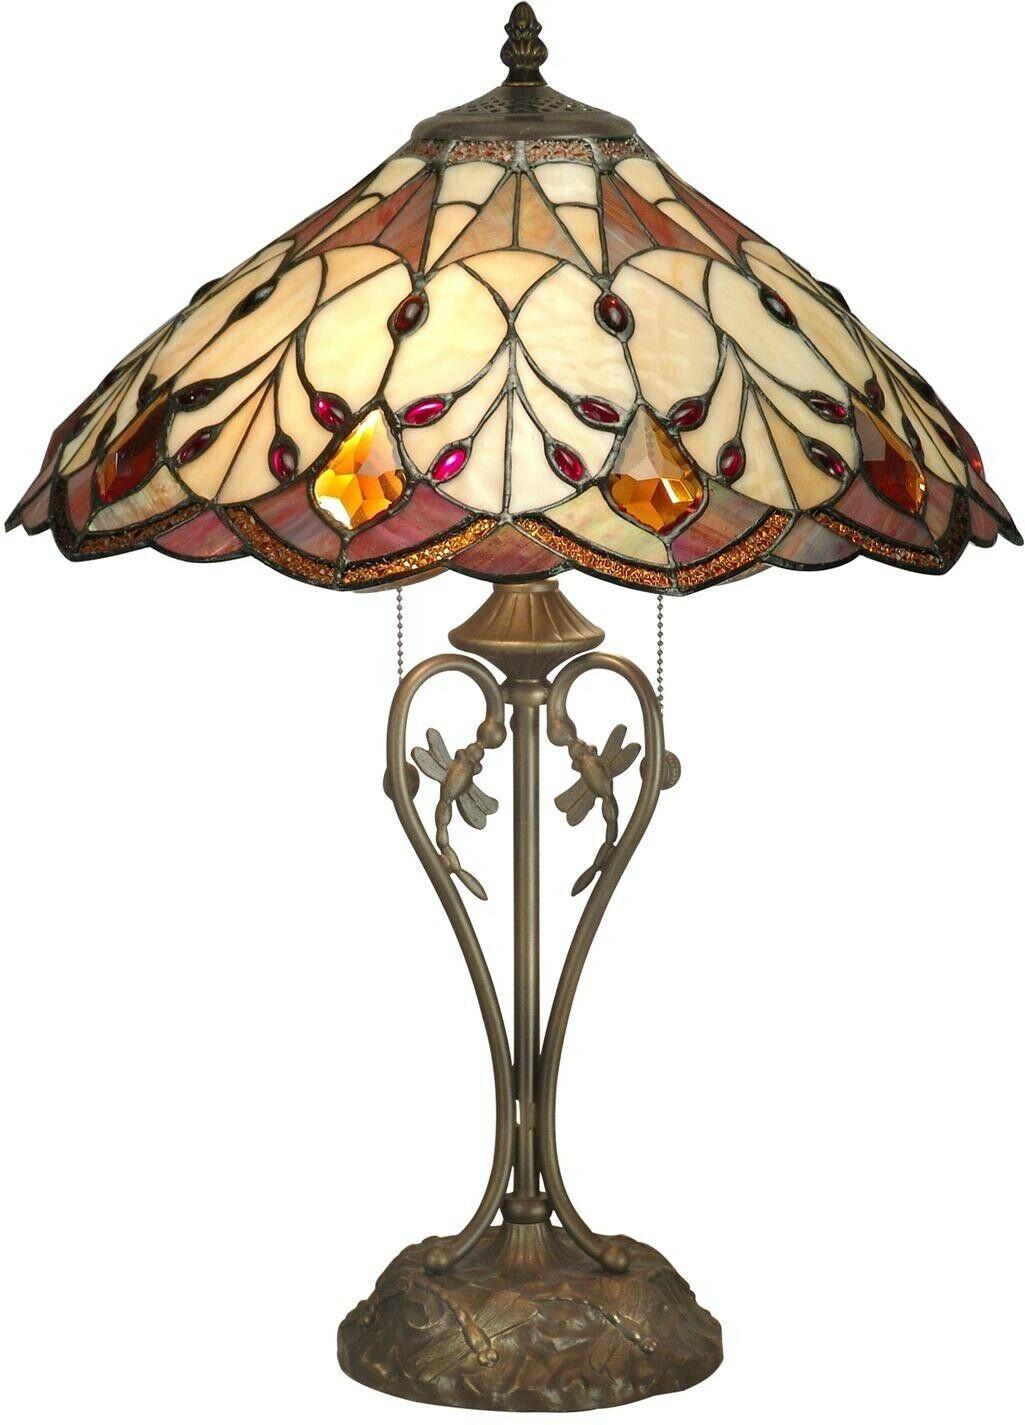 Pin On Tiffany Lamps